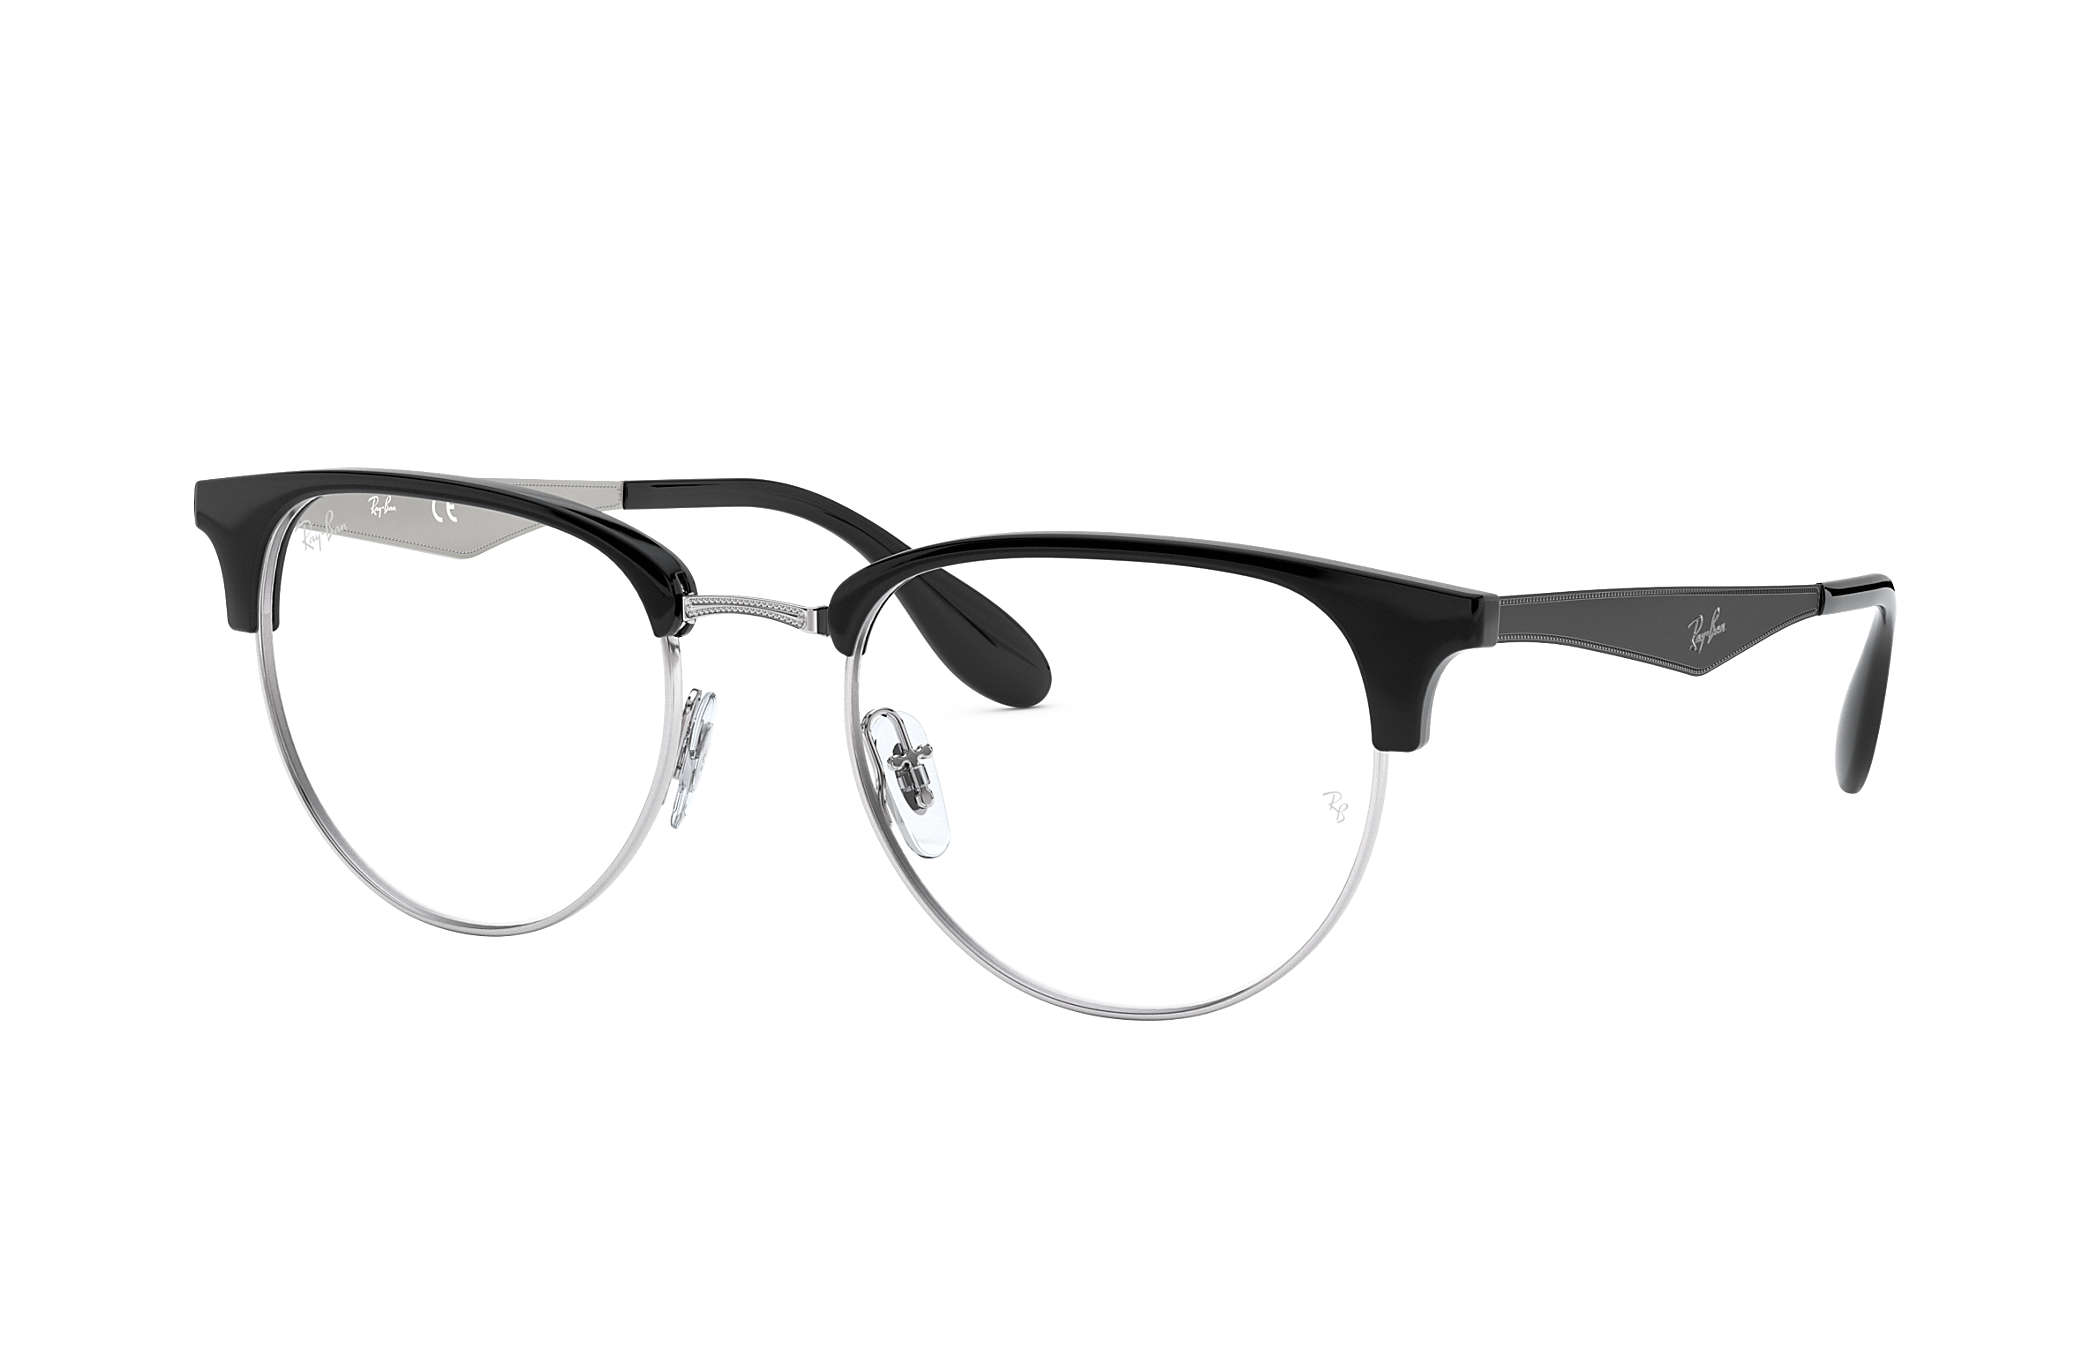 c97e68572 Ray-Ban prescription glasses RB6396 Silver - Metal - 0RX6396293253 ...